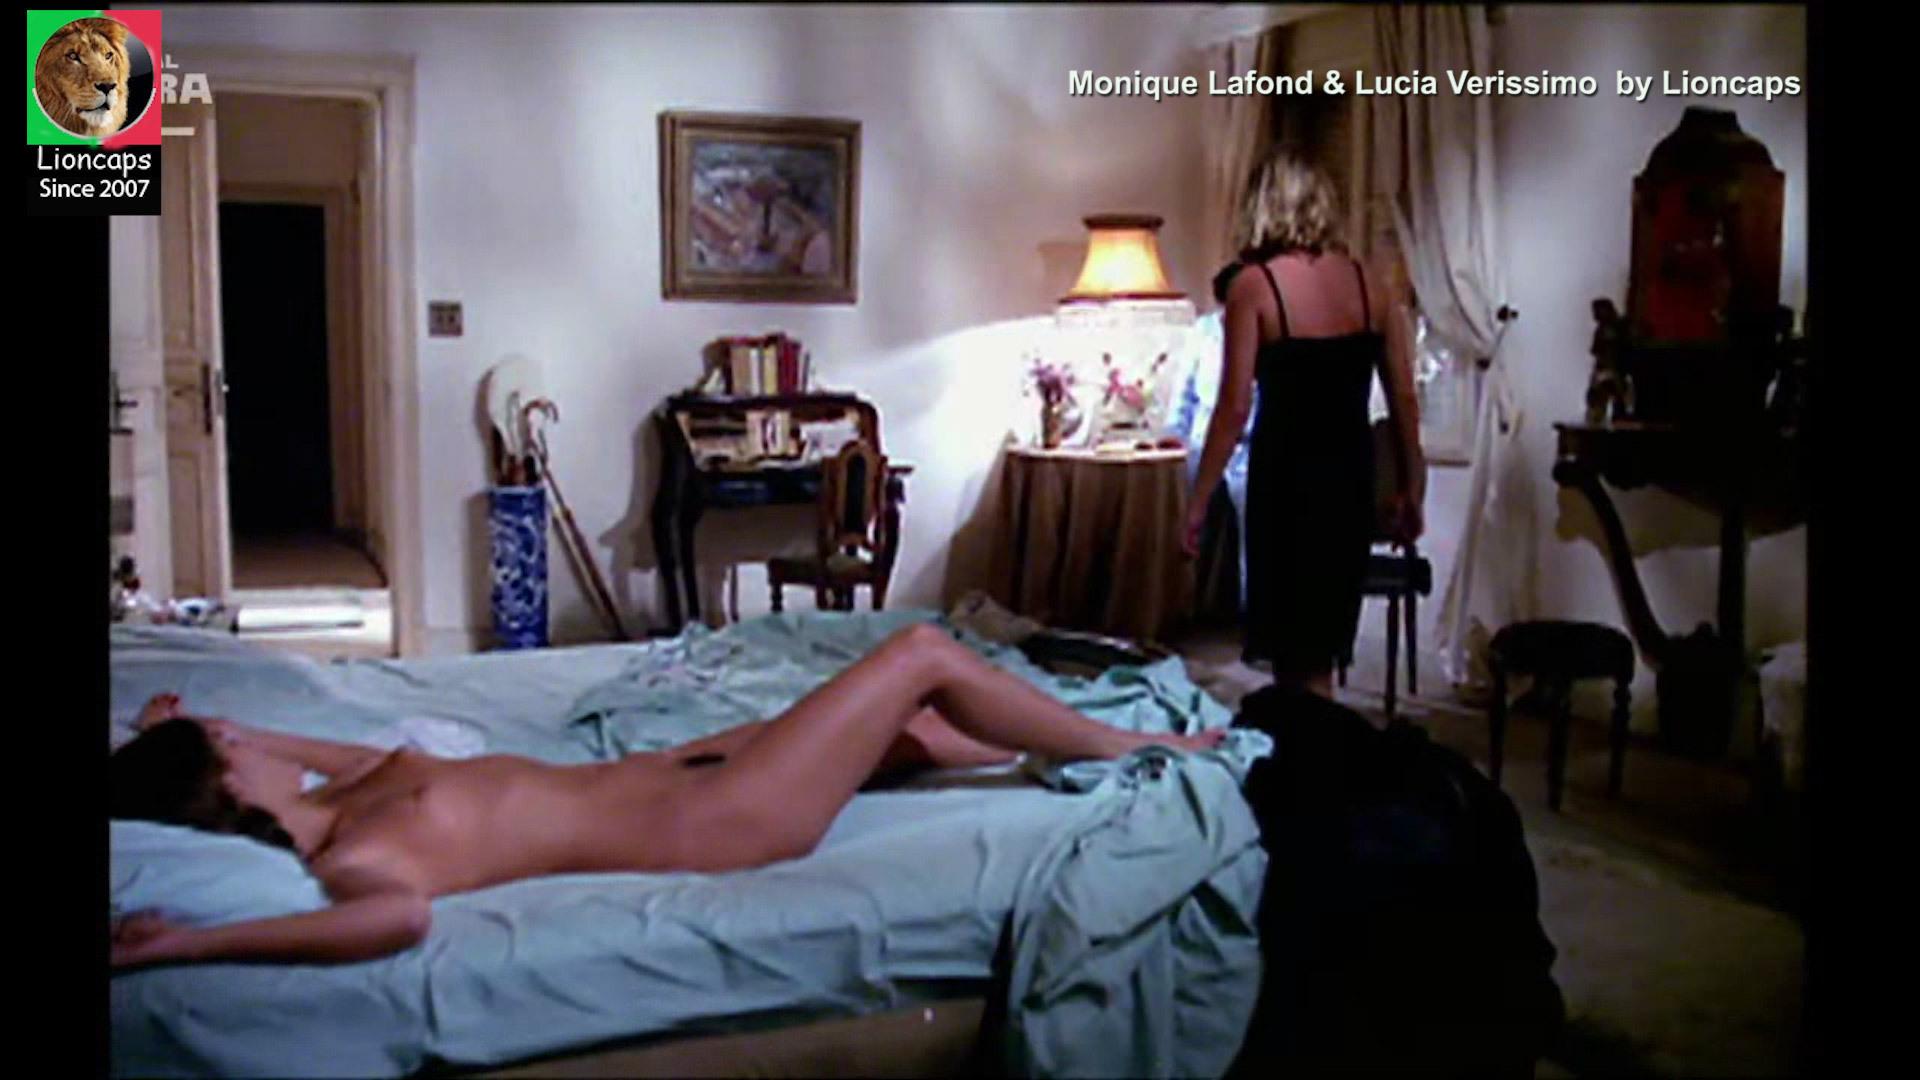 lucia_verissimo_monique_lafond_feras_lioncaps_14_02_2021 (9).jpg